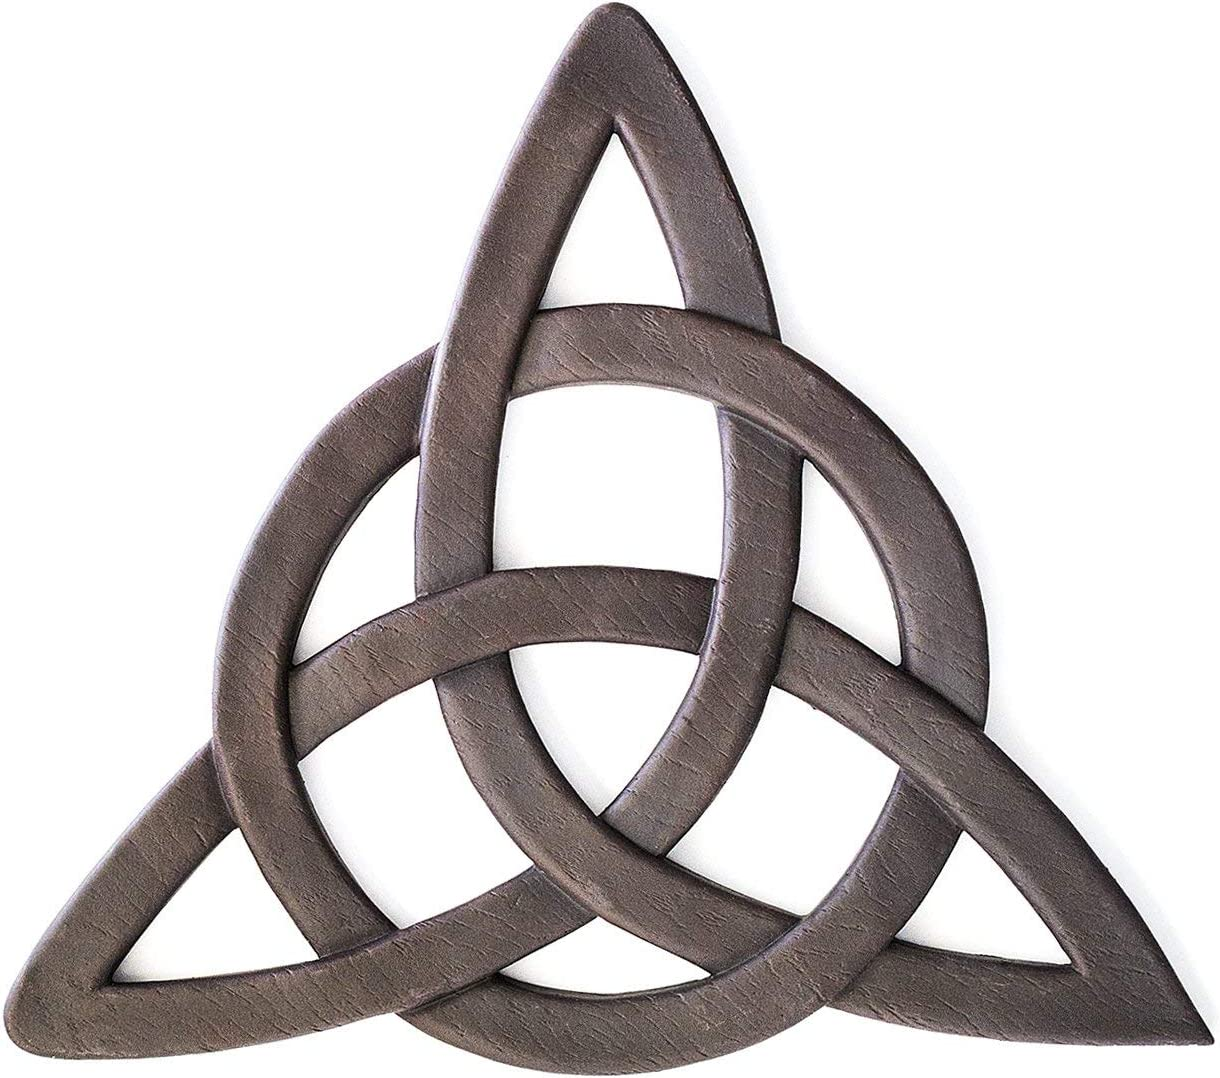 Handy Basics Resin Celtic Trinity Knot Wall Art for Home Decoration 10